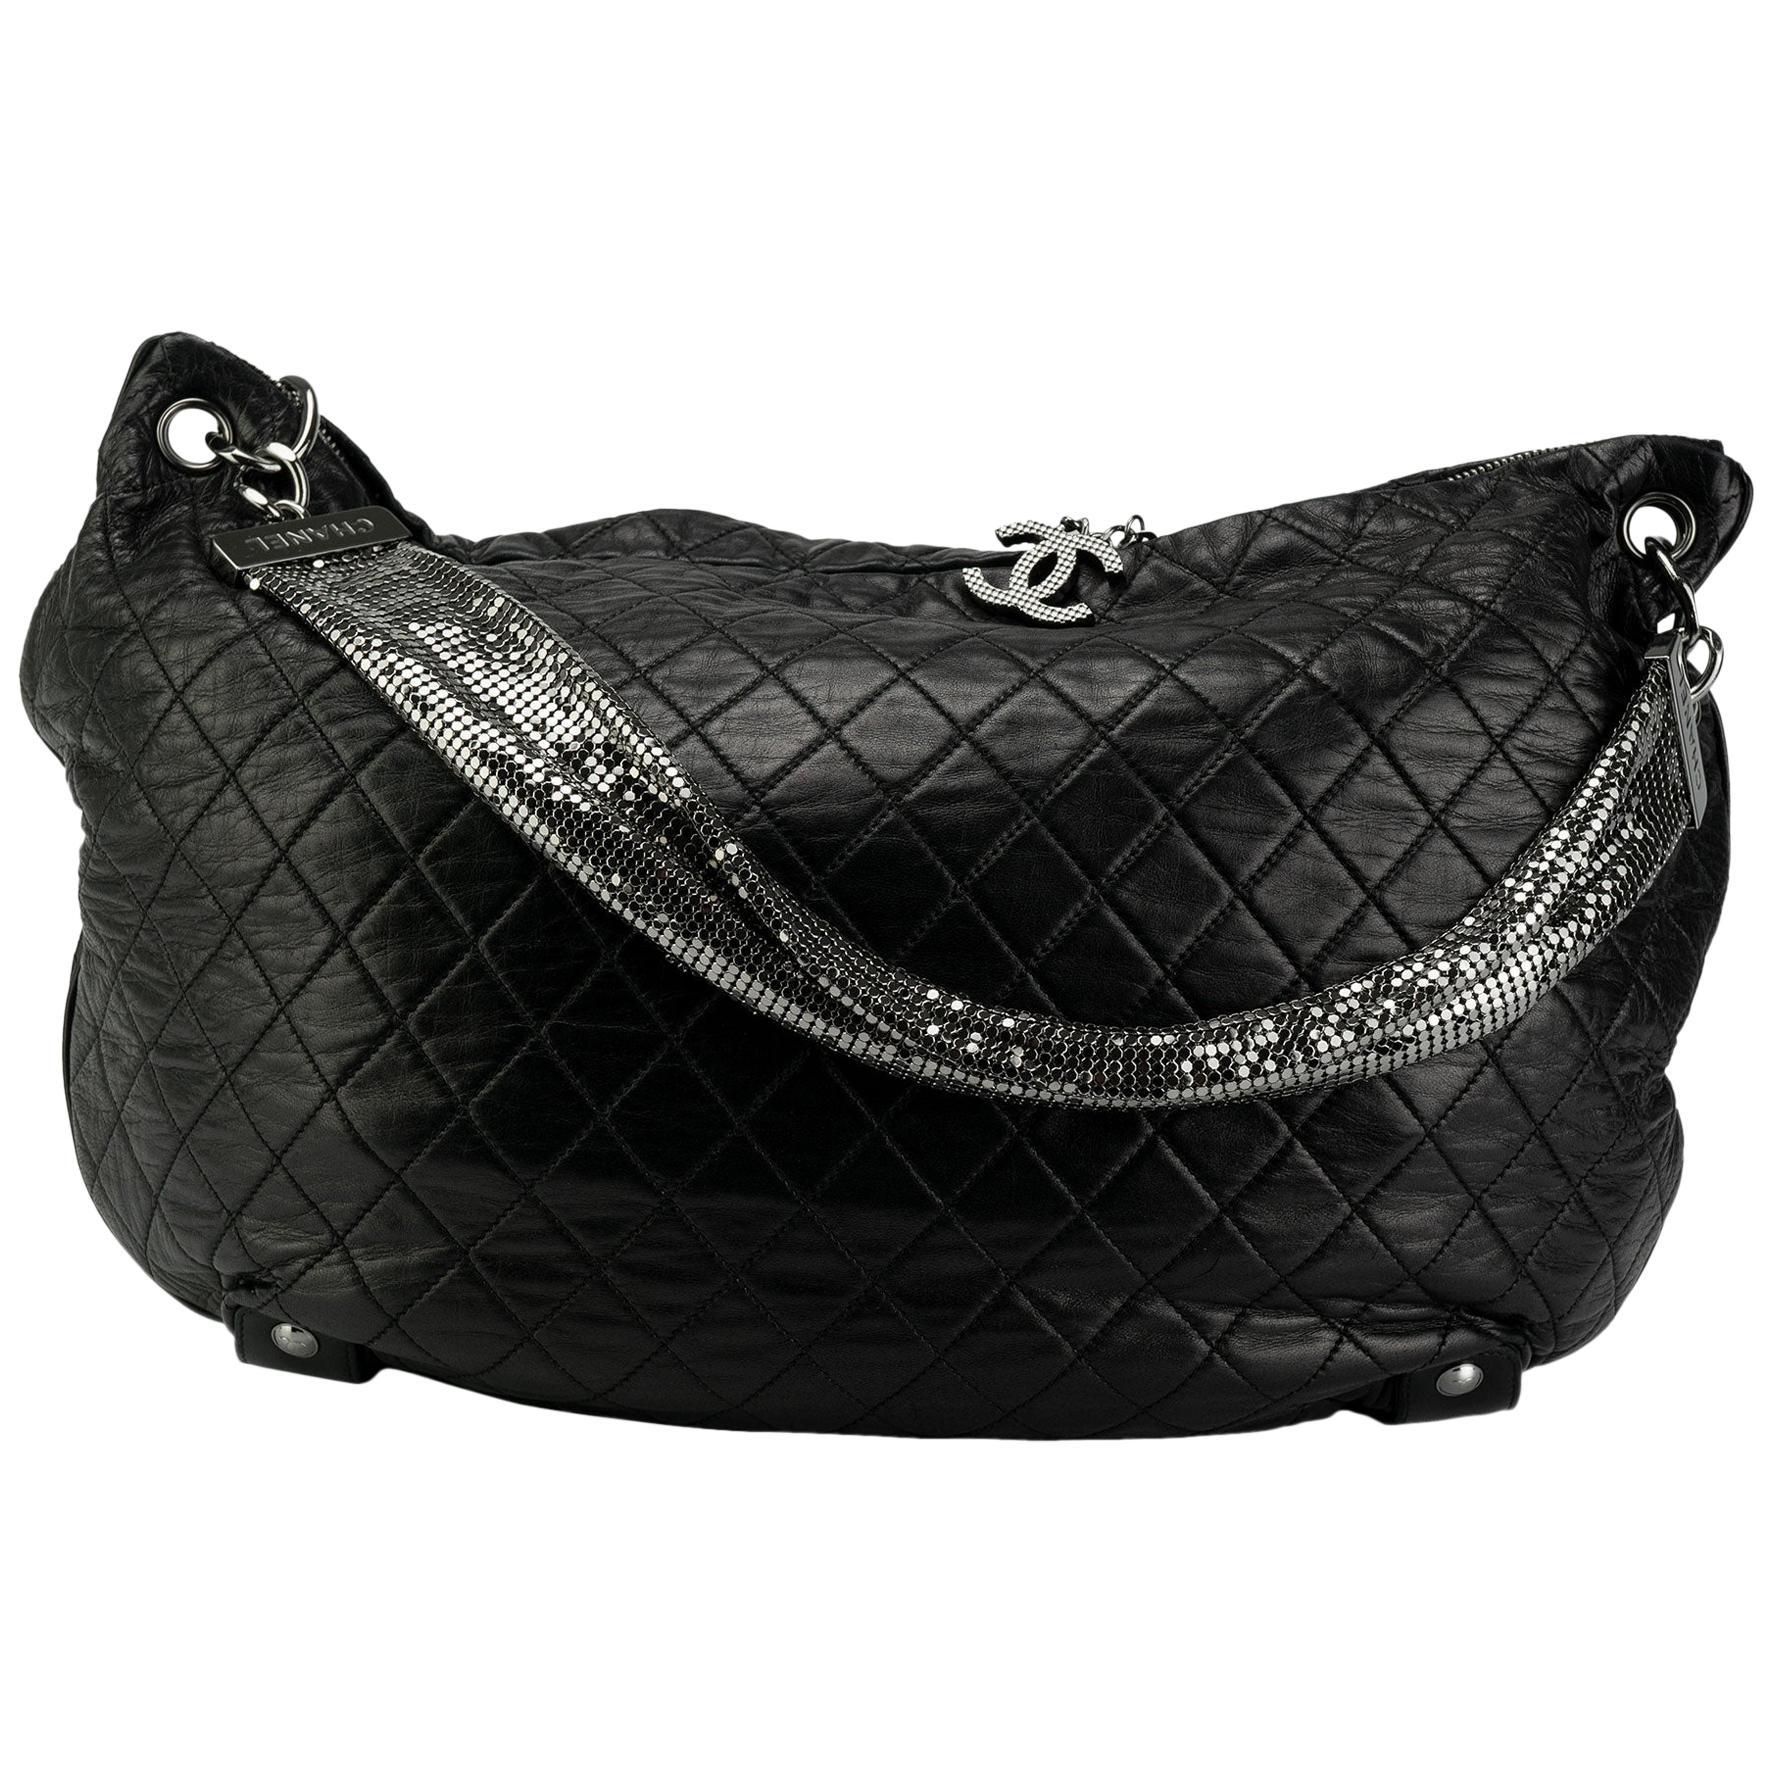 279a146ec13d Vintage Chanel Purses and Handbags at 1stdibs